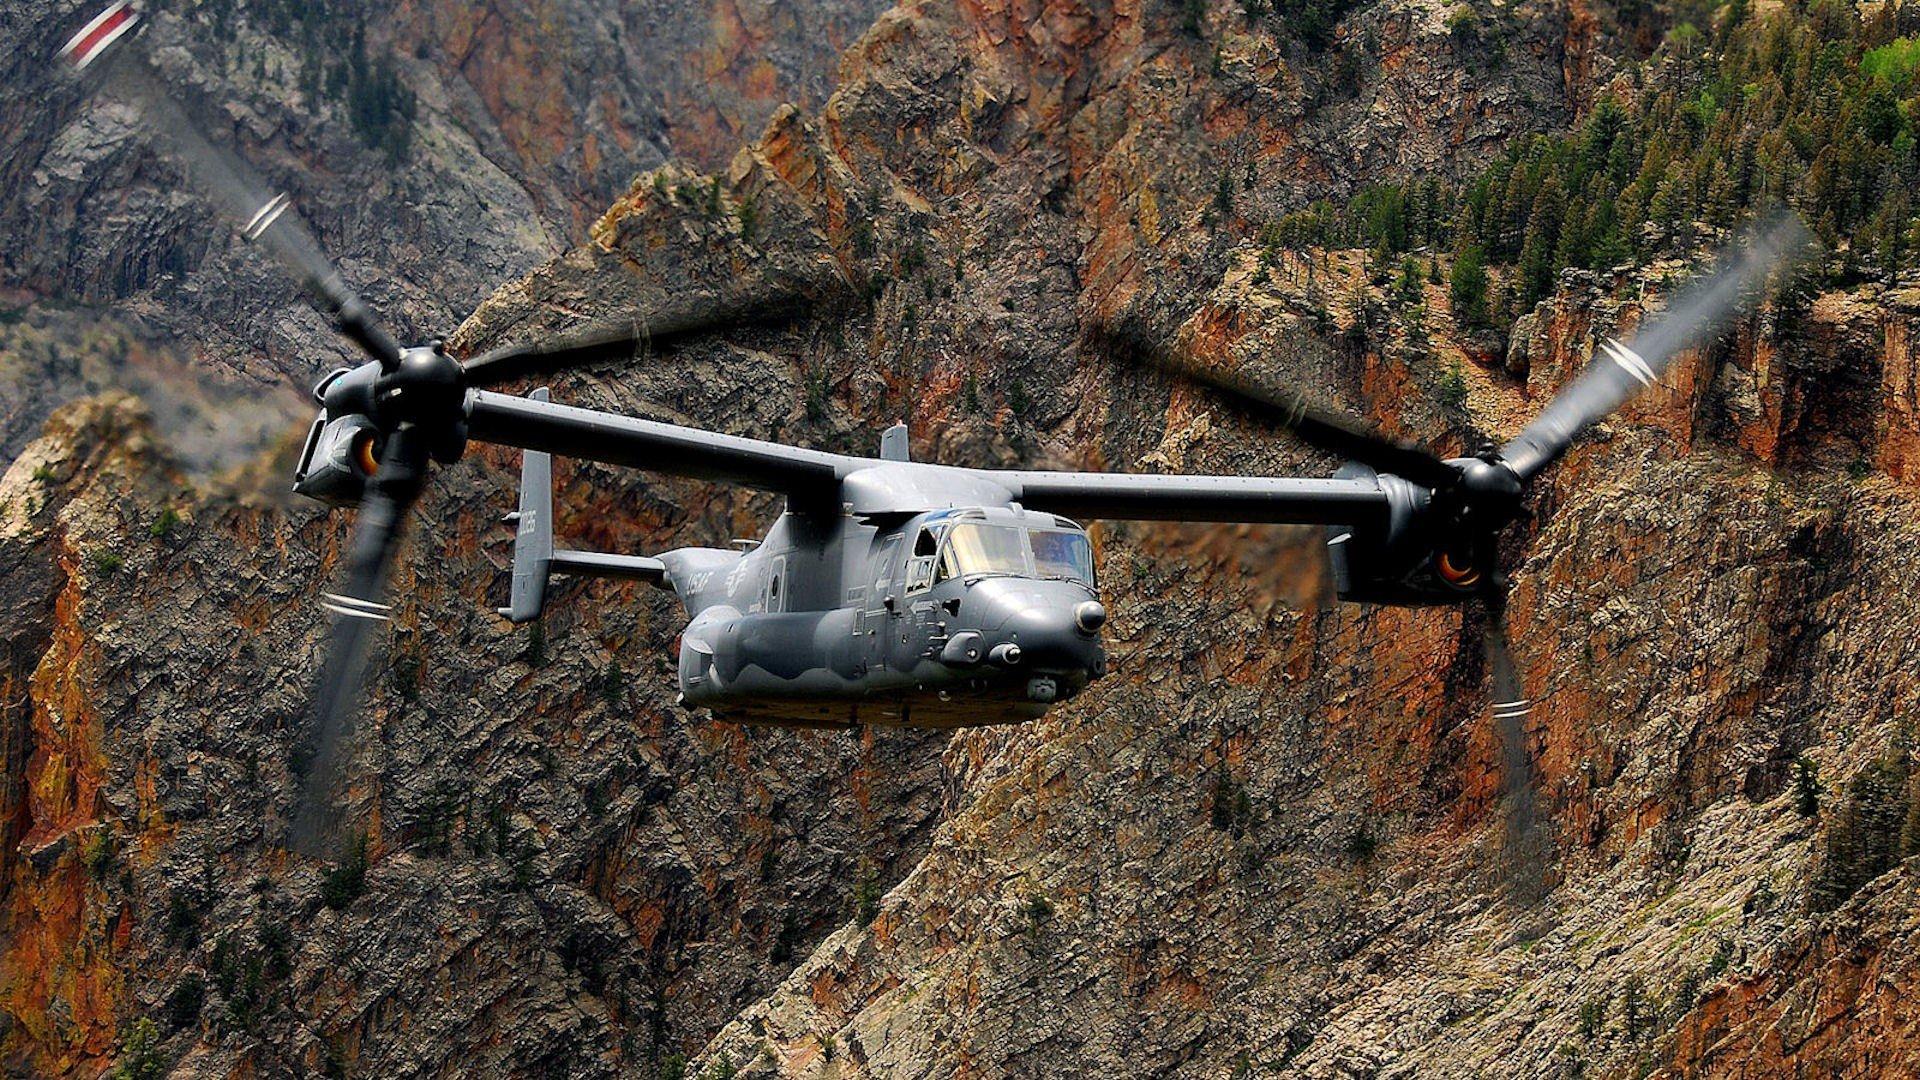 Hintergrundbilder : 1920x1080 px, 22 Osprey, Lebenslauf 1920x1080 ...